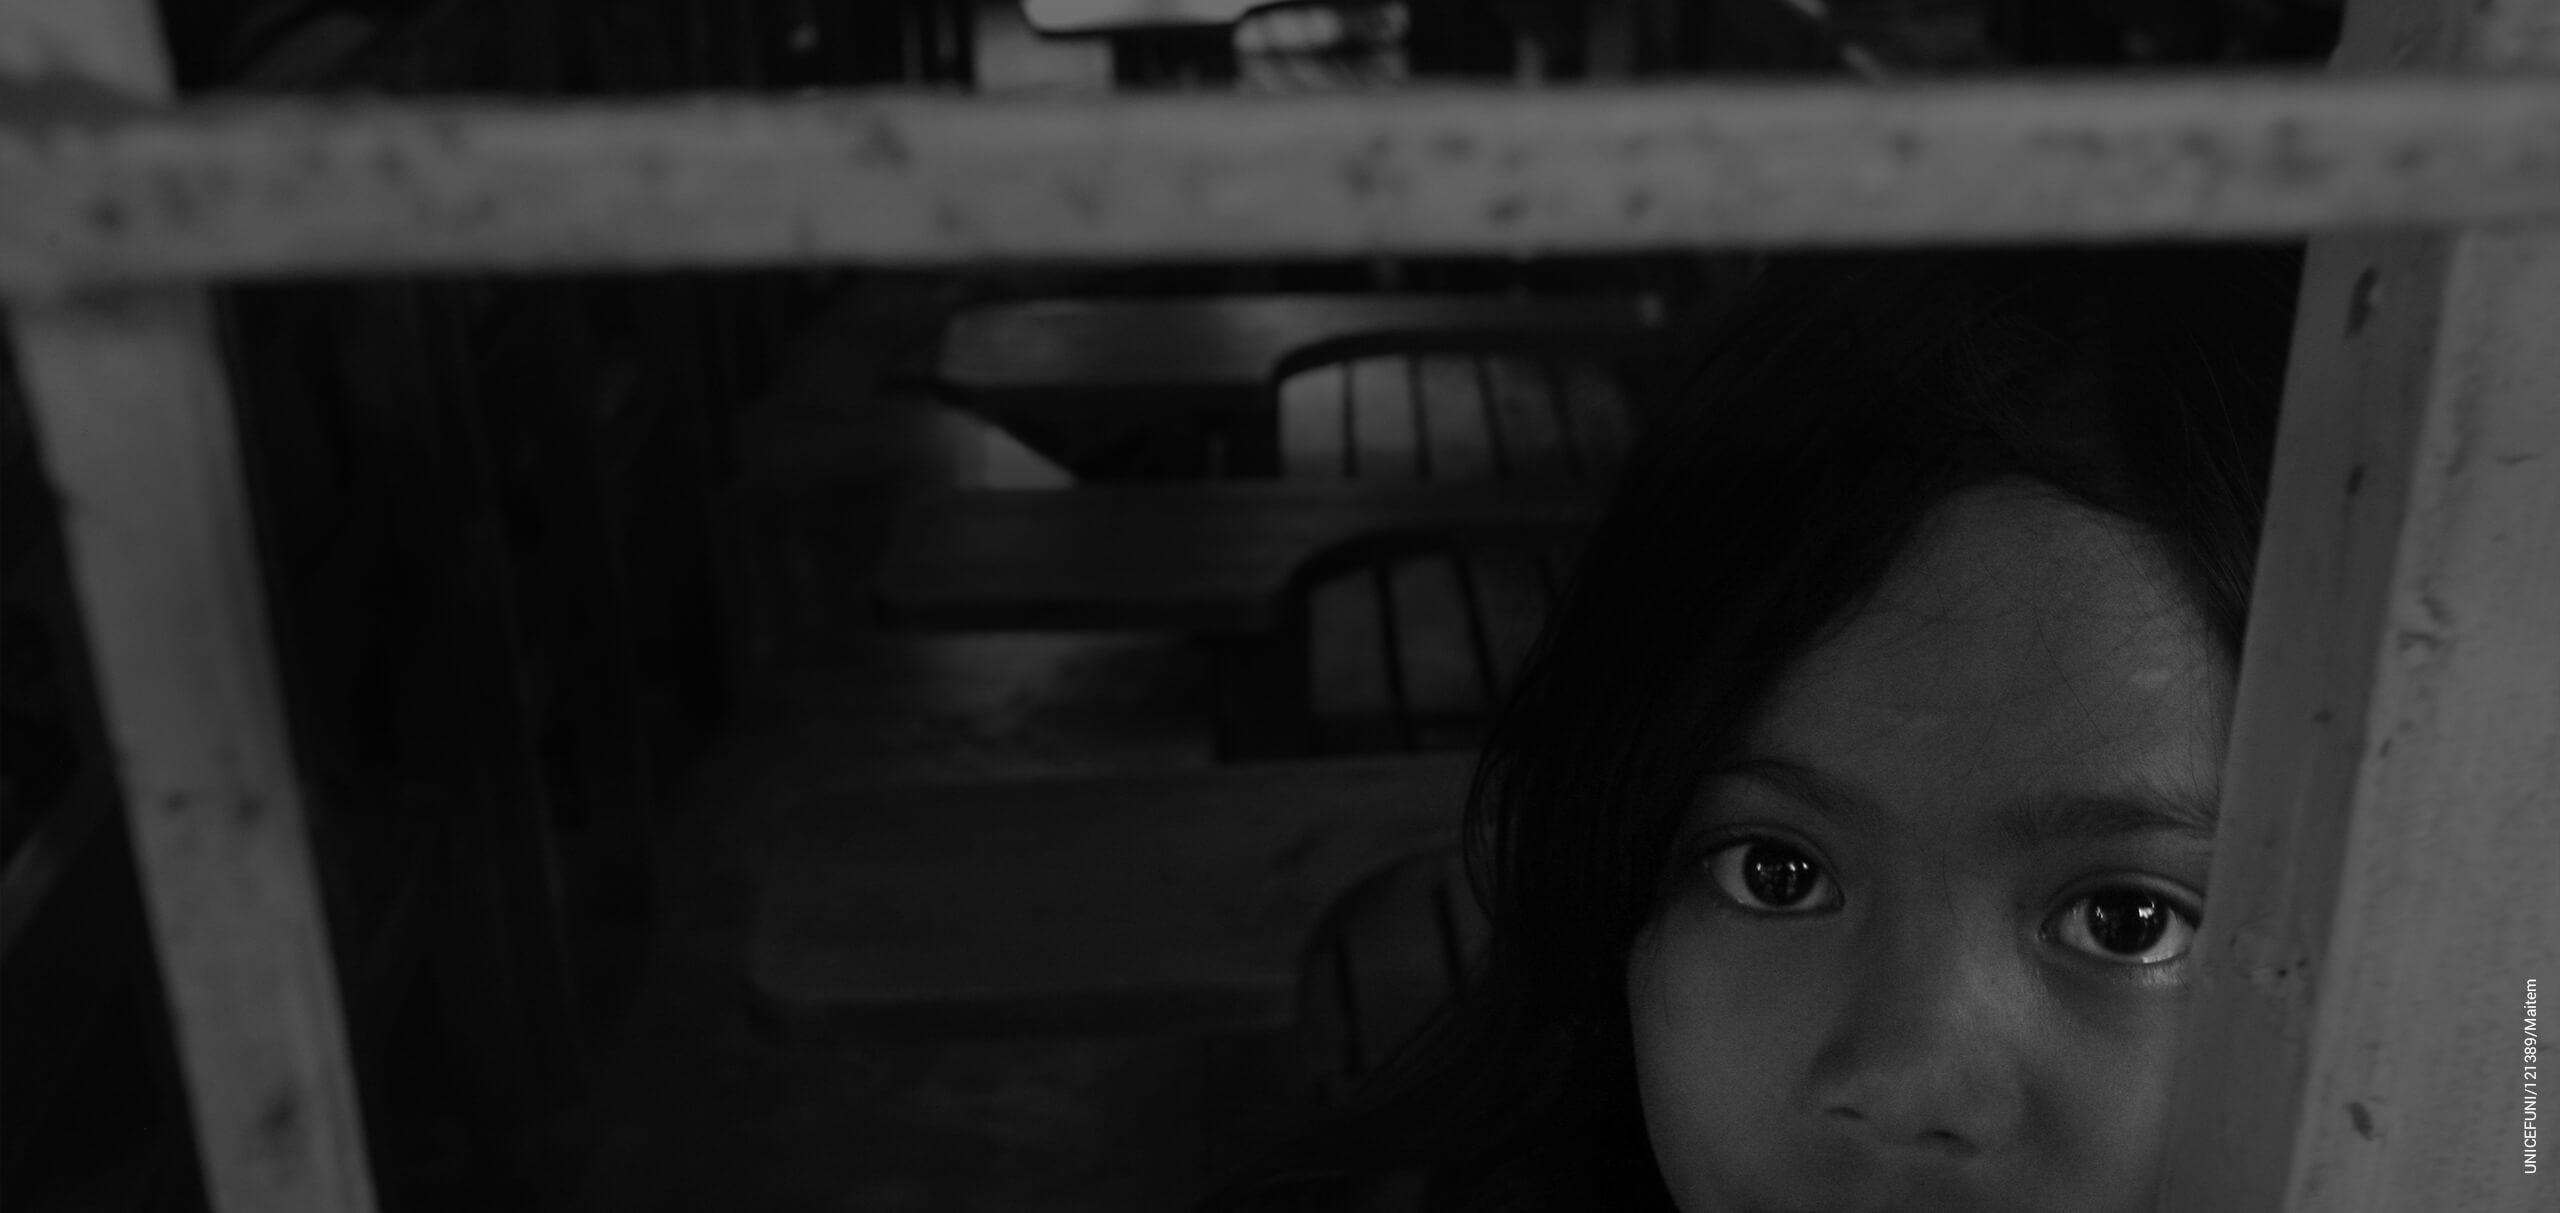 Globe strengthens commitment vs online sexual abuse of children